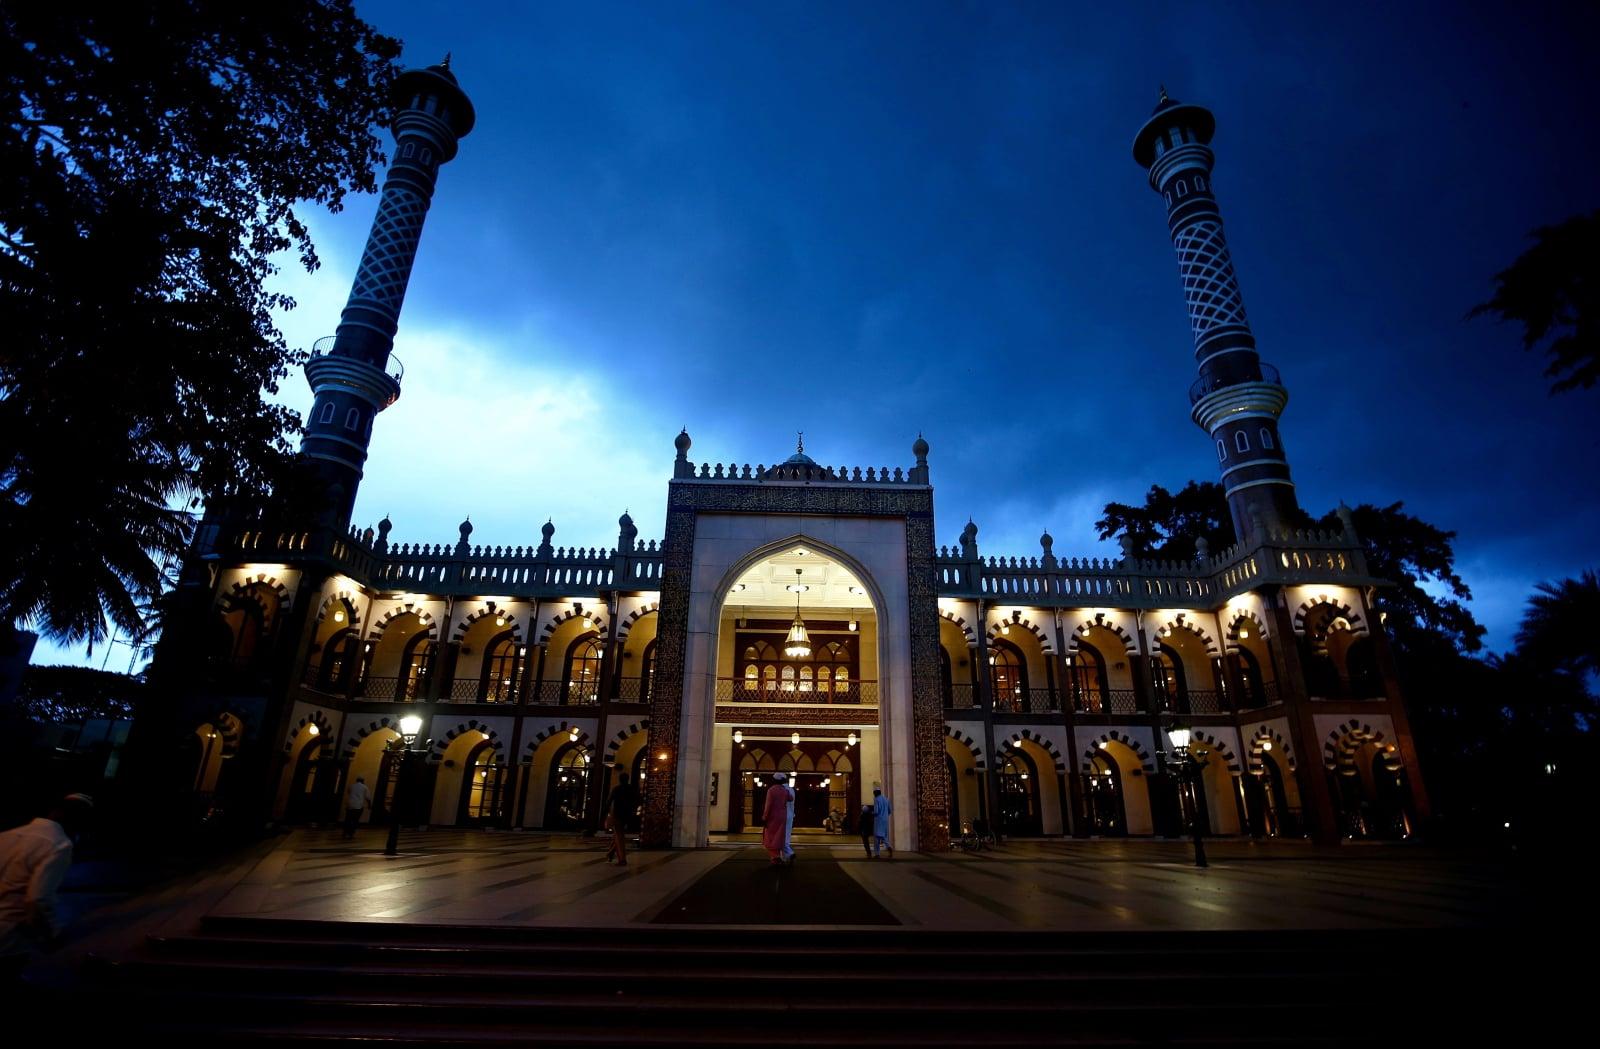 Meczet w Bangladore fot. EPA/JAGADEESH NV